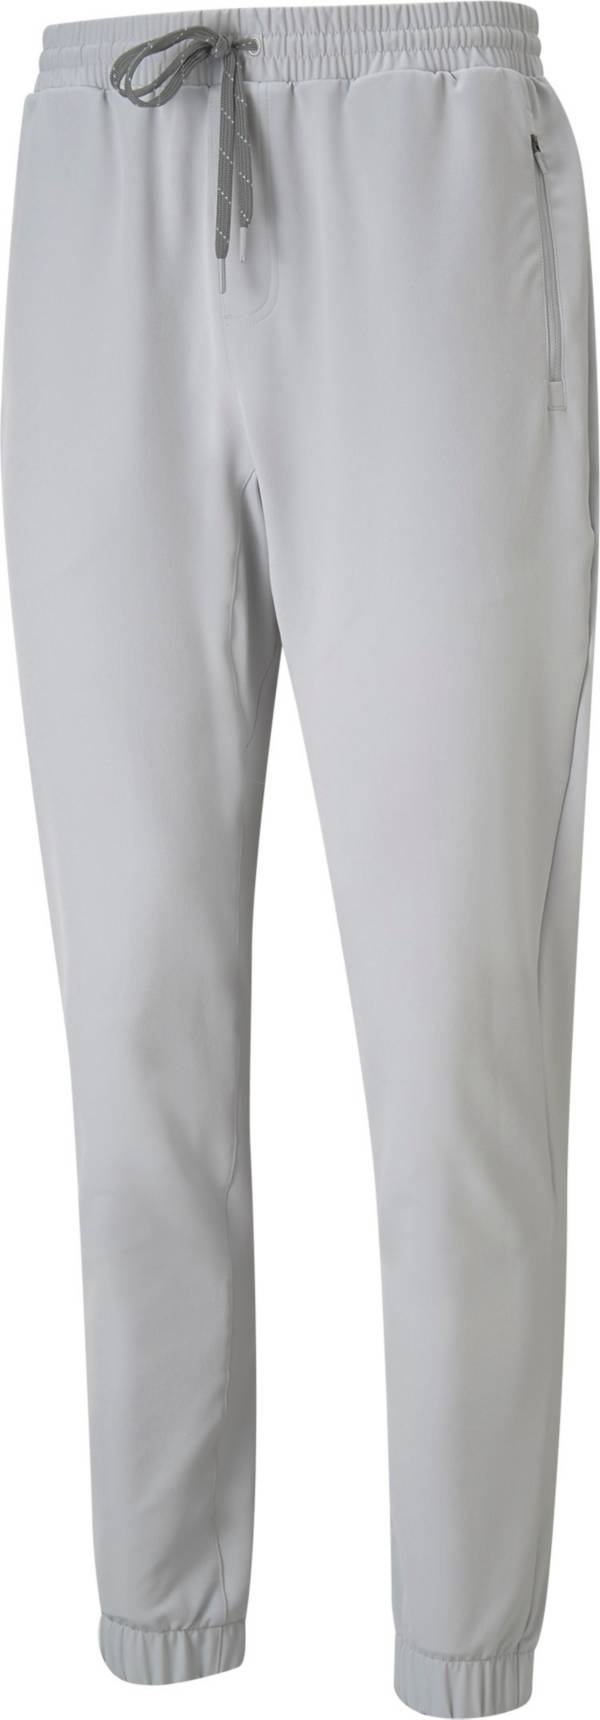 PUMA Men's Excellent Golf Wear 9-Hole Golf Joggers product image